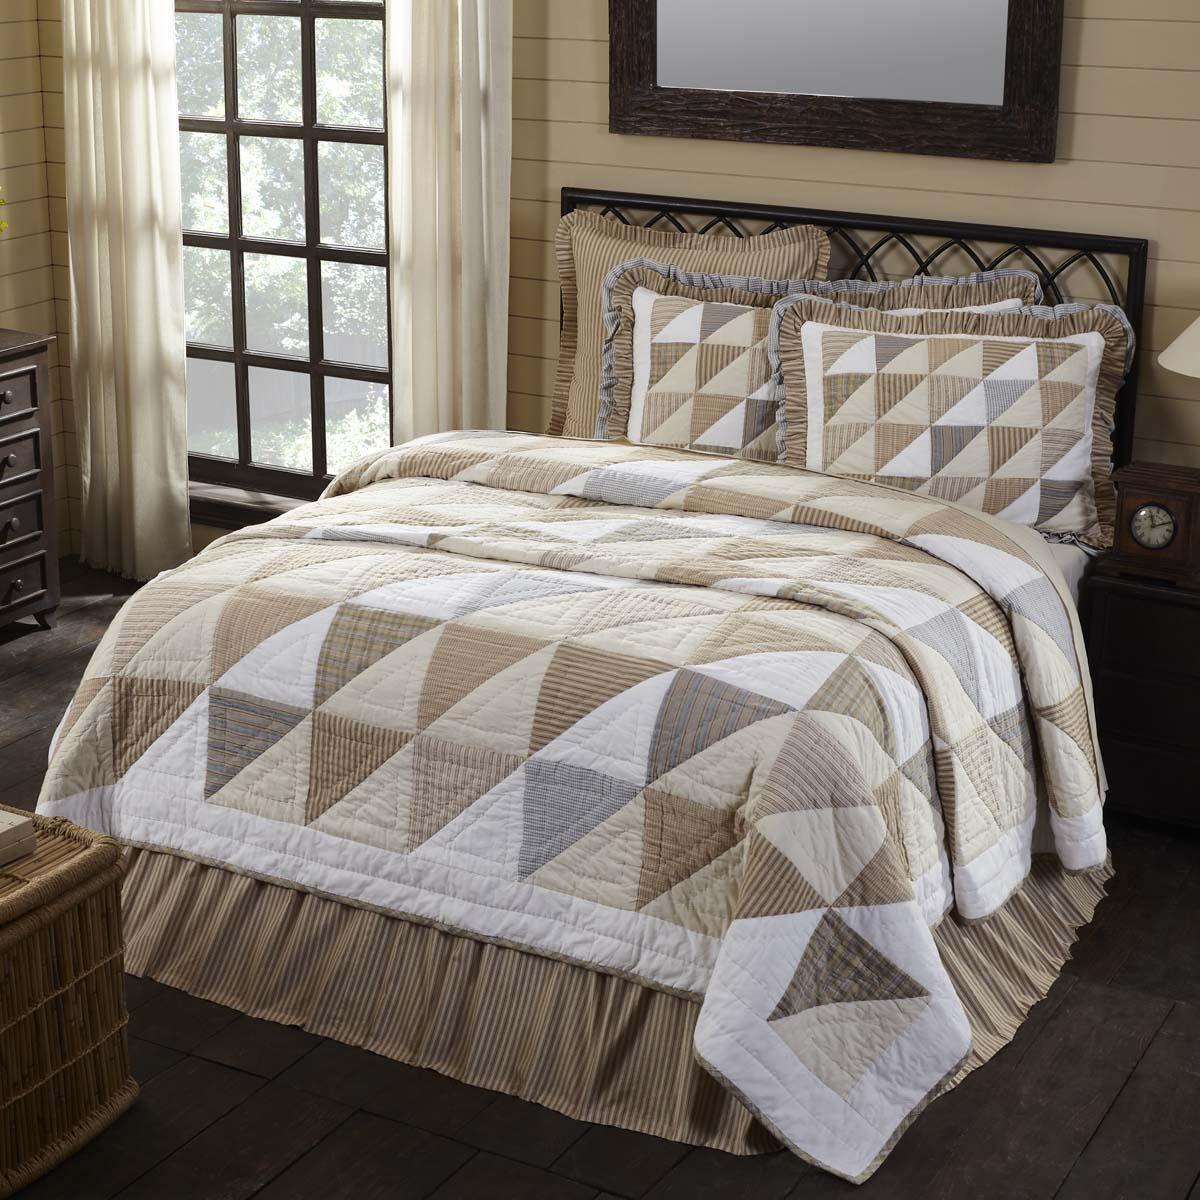 Joanna Luxury King Quilt 120Wx105L